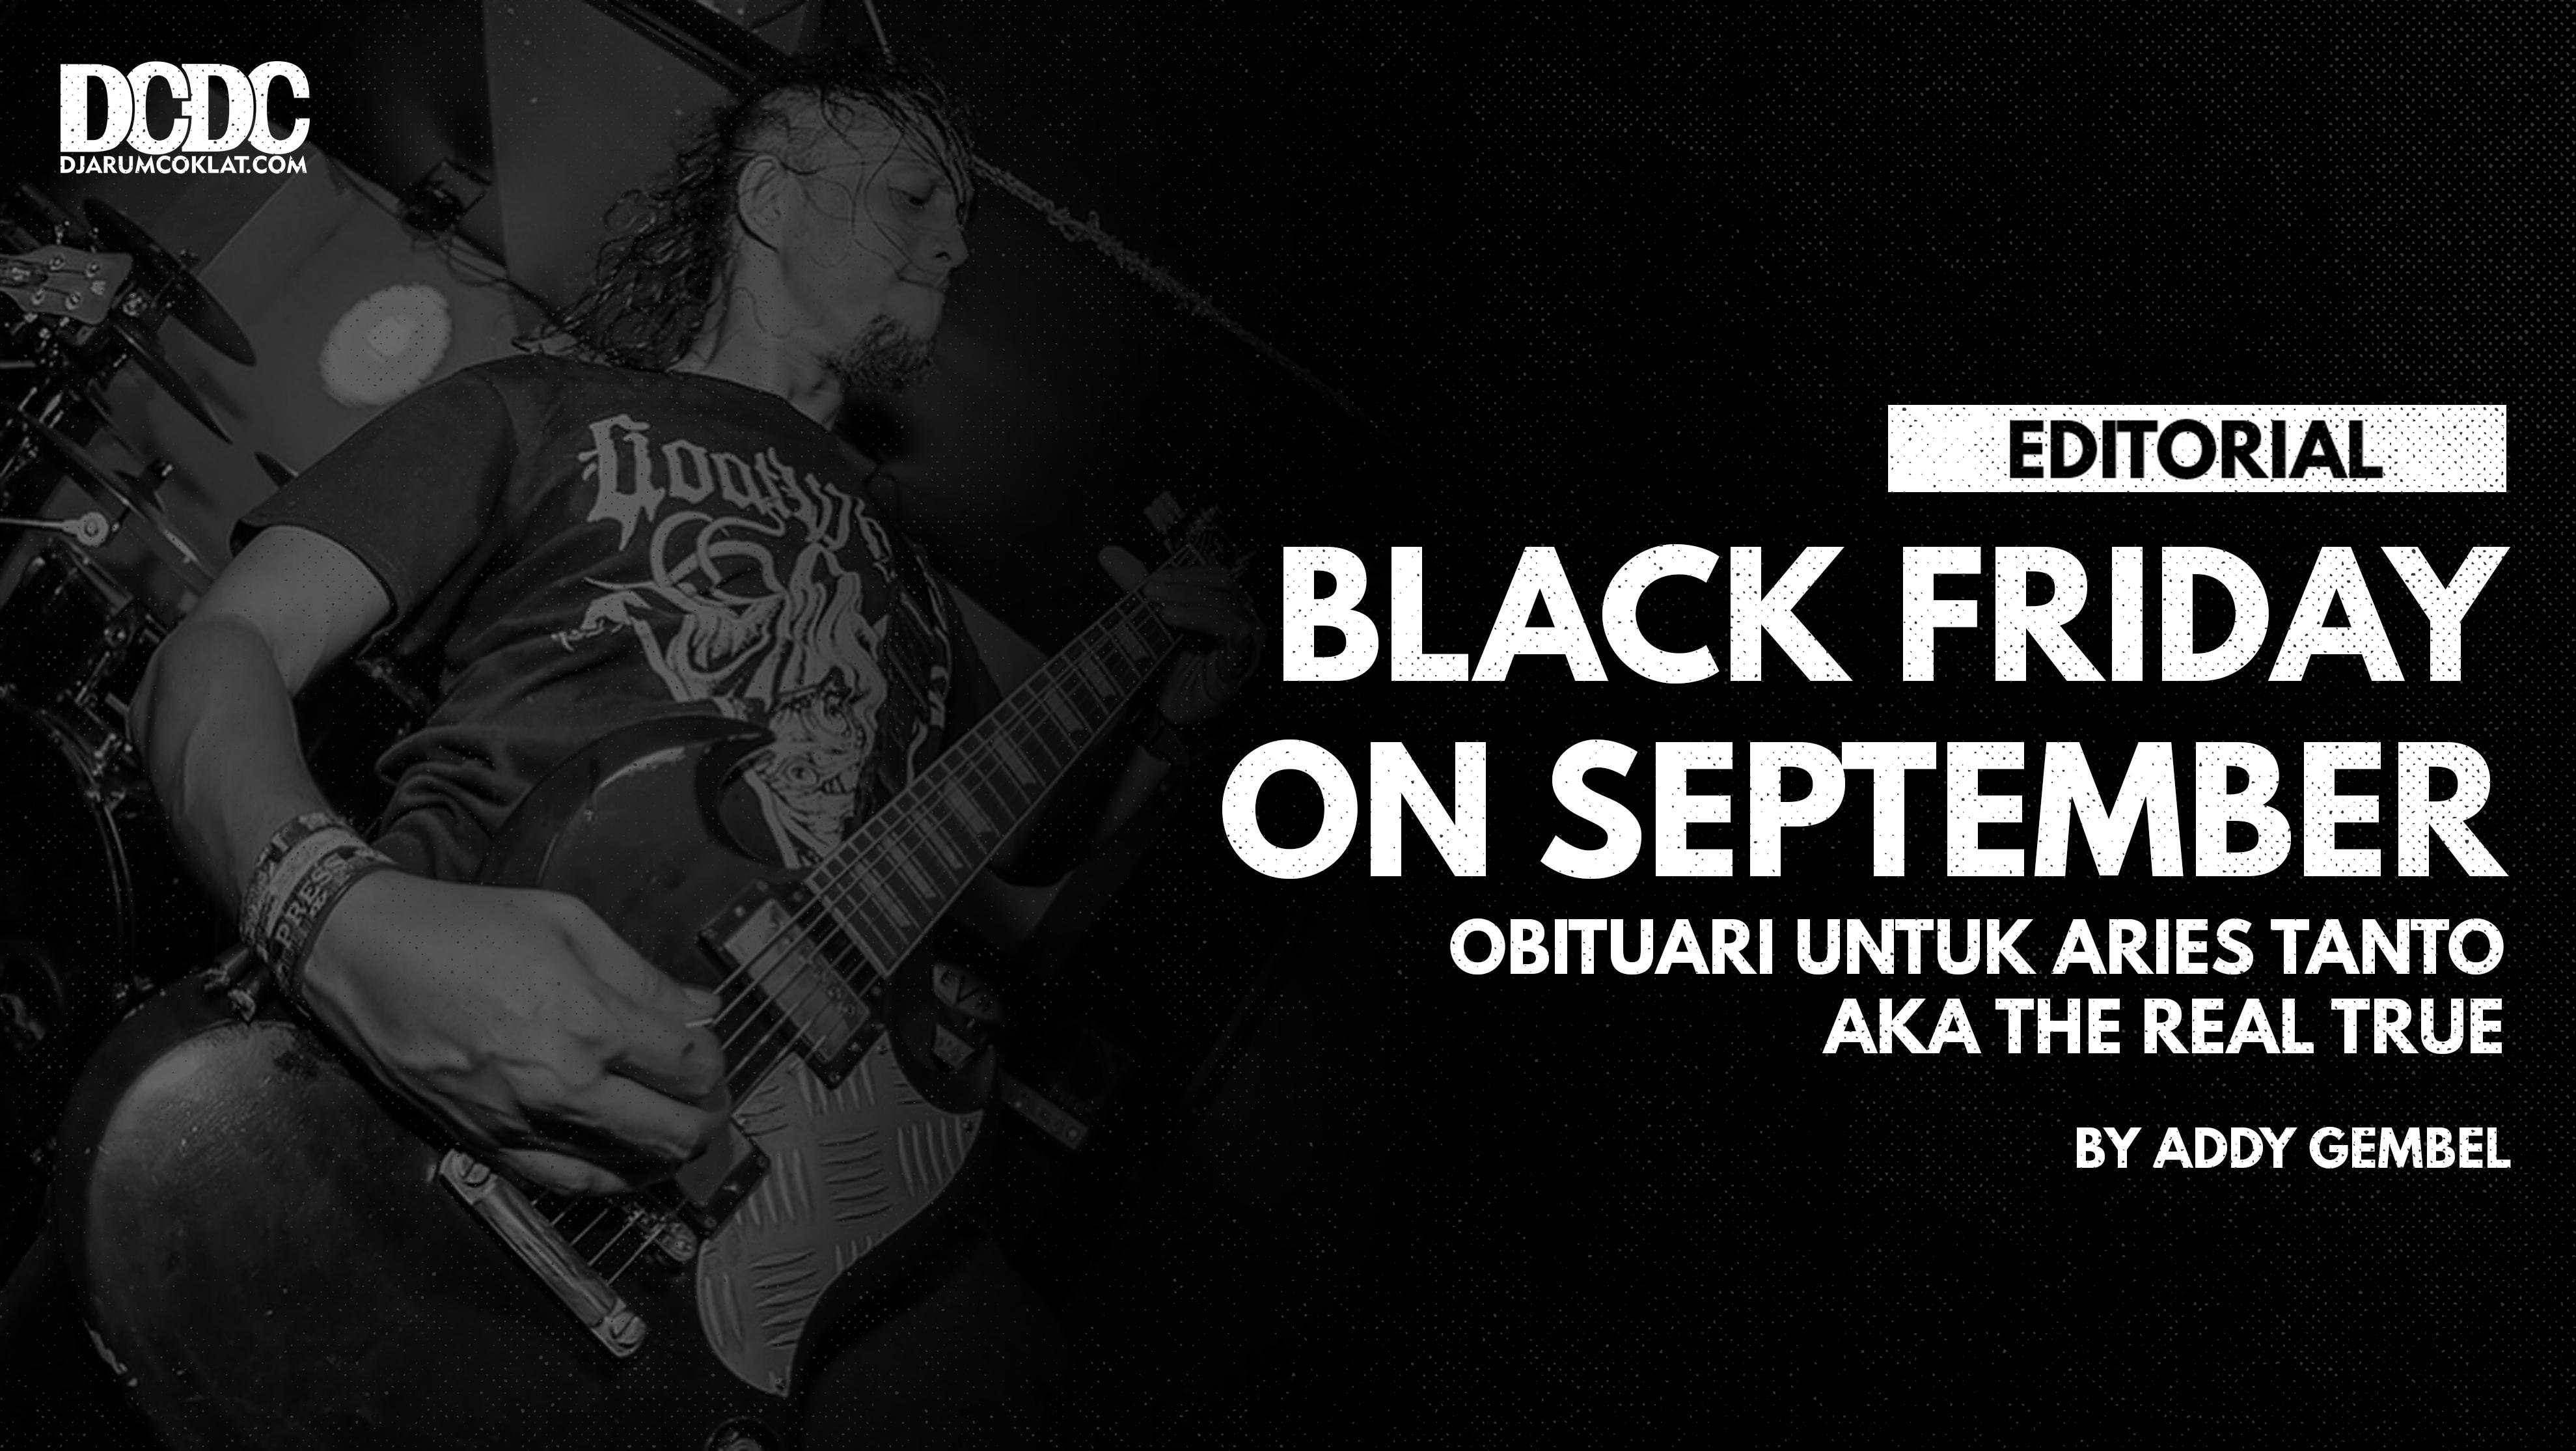 Black Friday On September, Obituari Untuk Aries Tanto aka The Real True